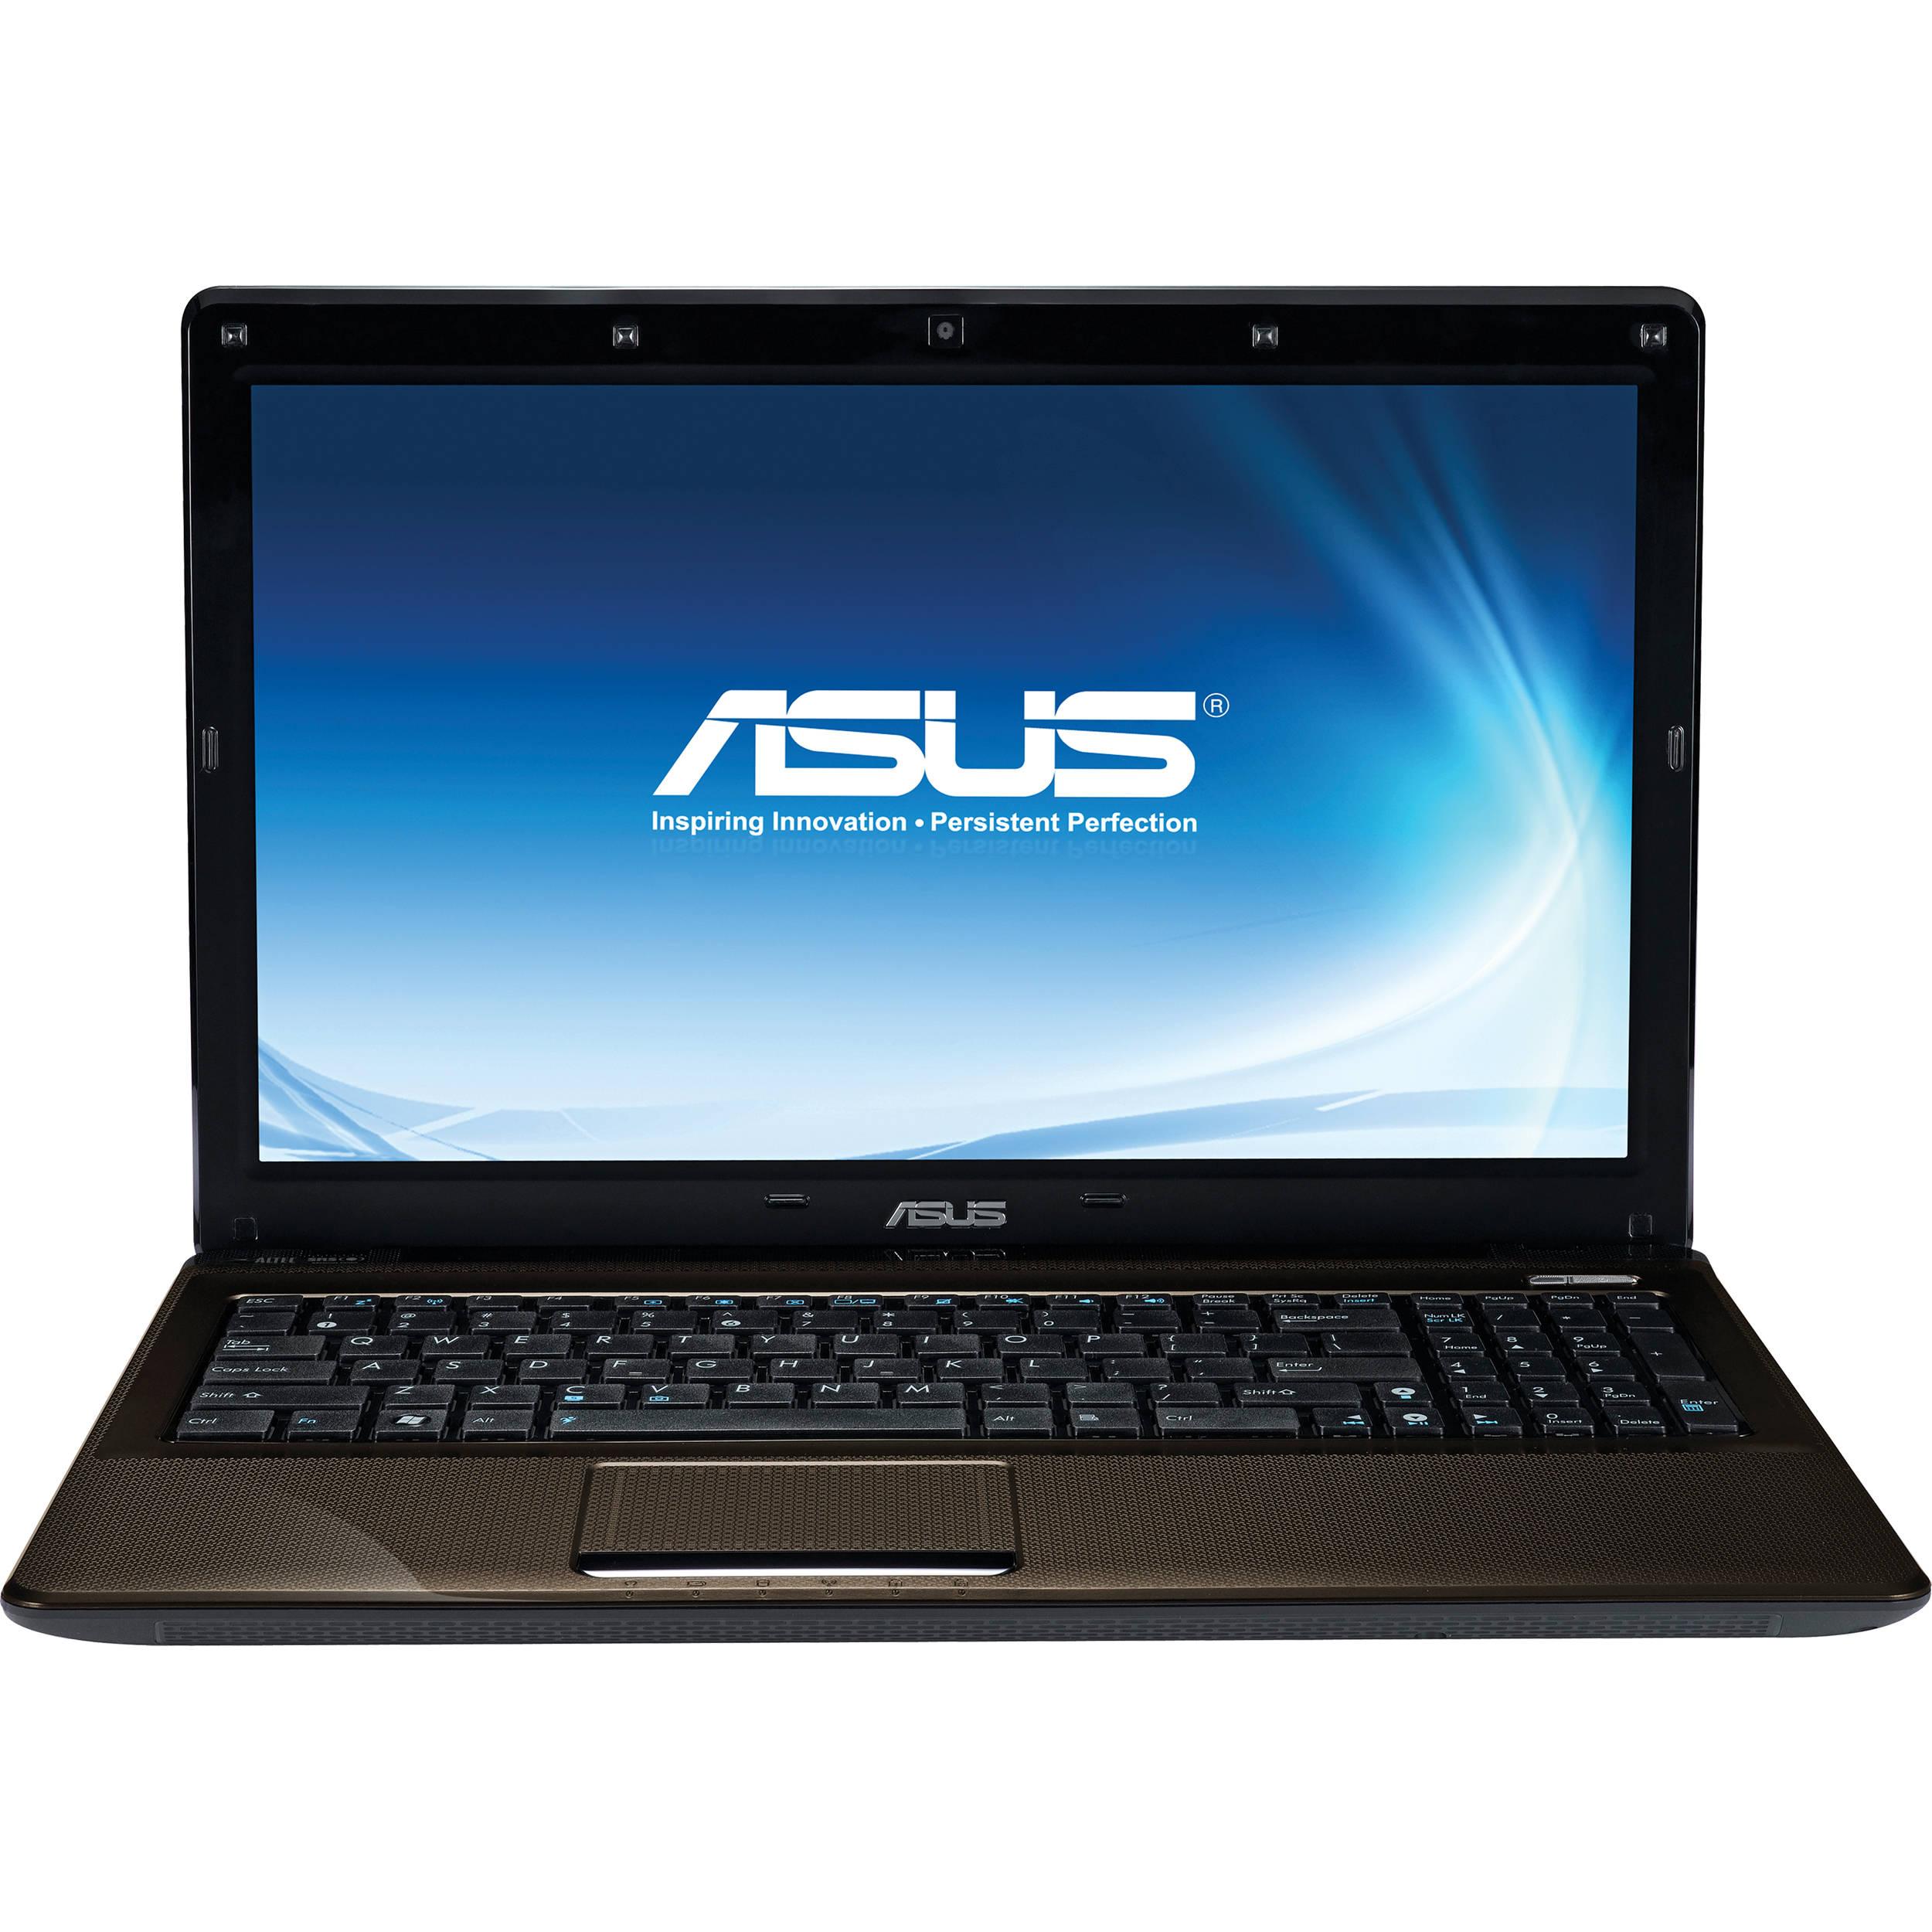 Asus K52JU Notebook Power4Gear Hybrid Windows 8